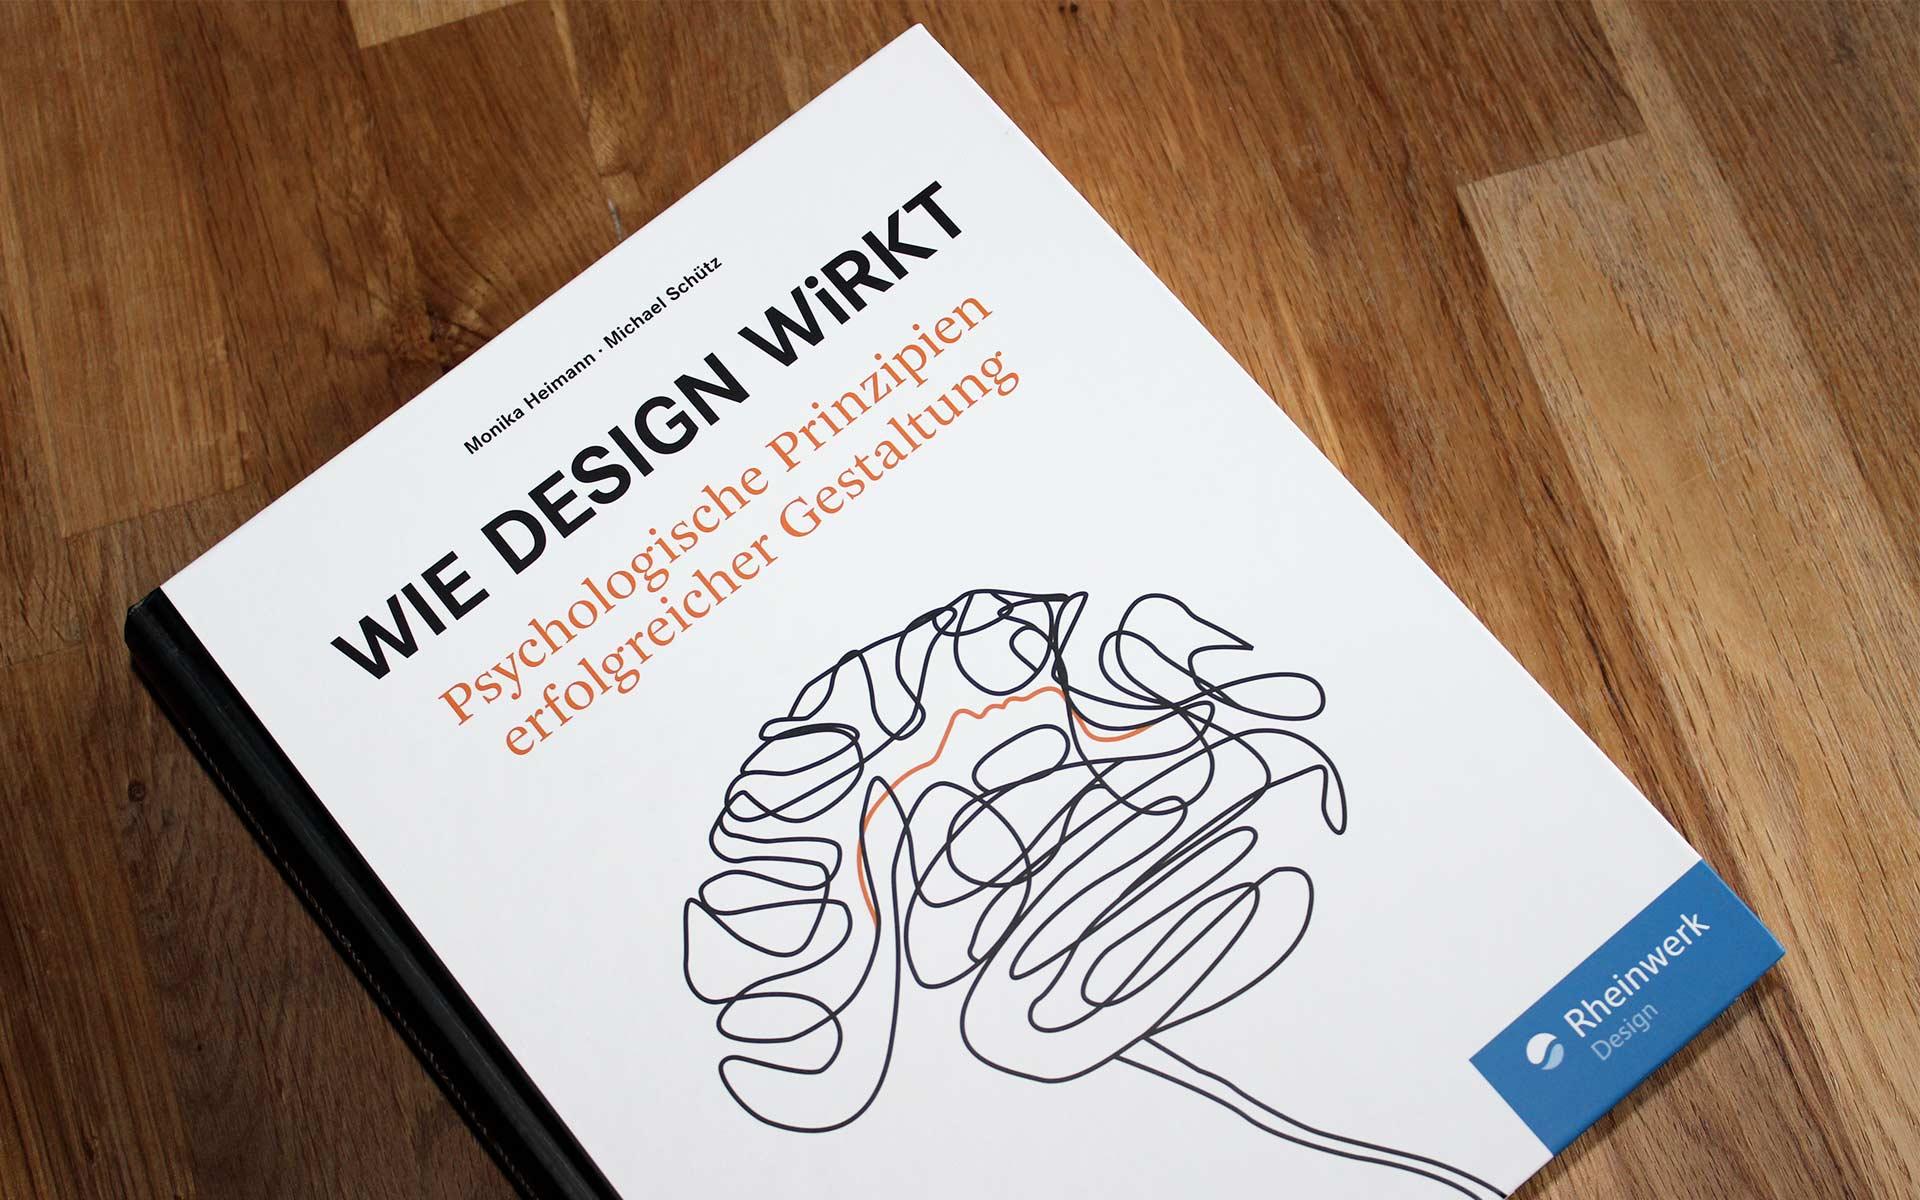 Review: Wie Design wirkt - matter of design